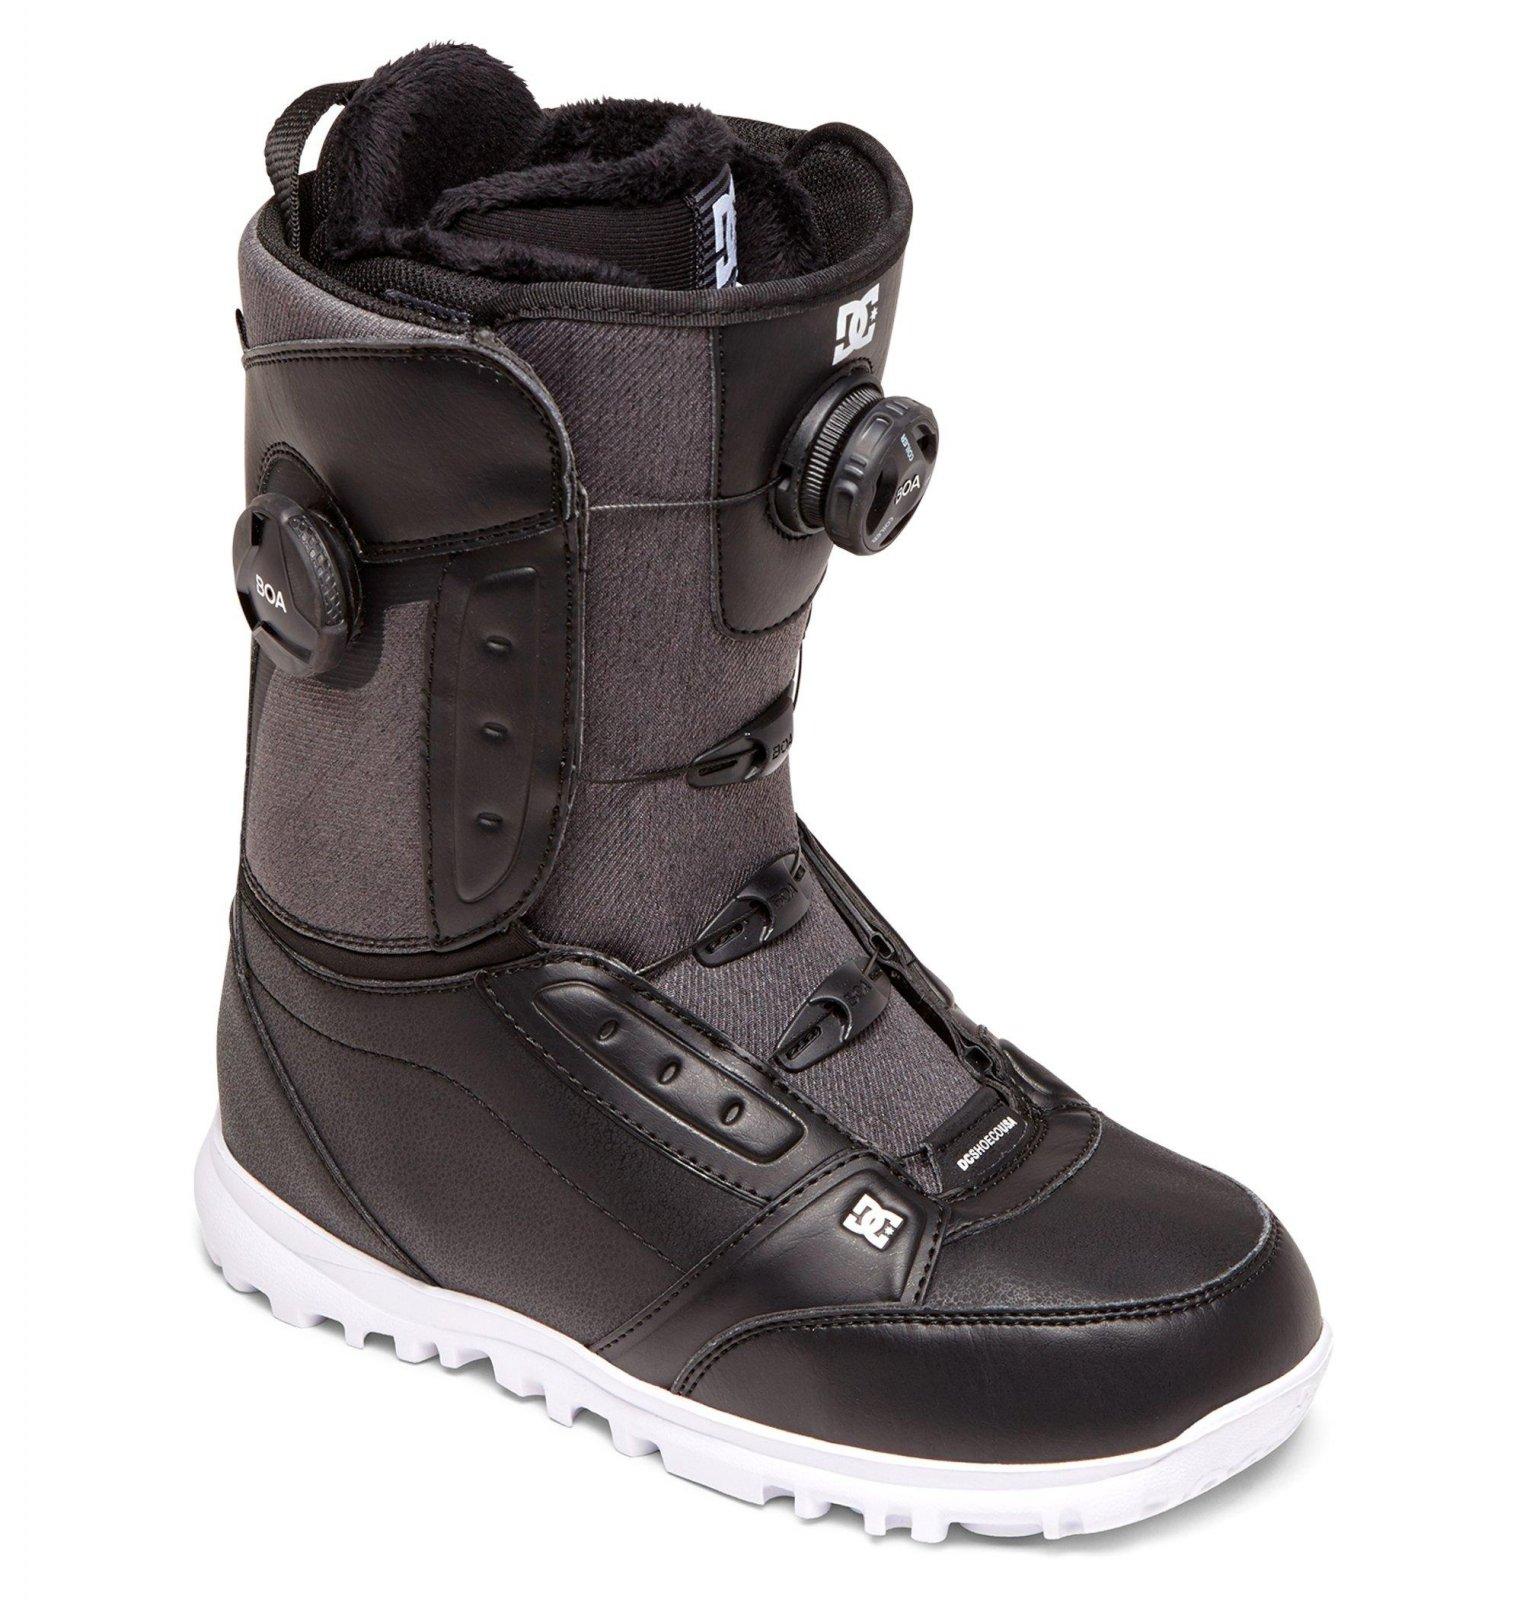 DC Lotus BOA Snowboard Boots 2020